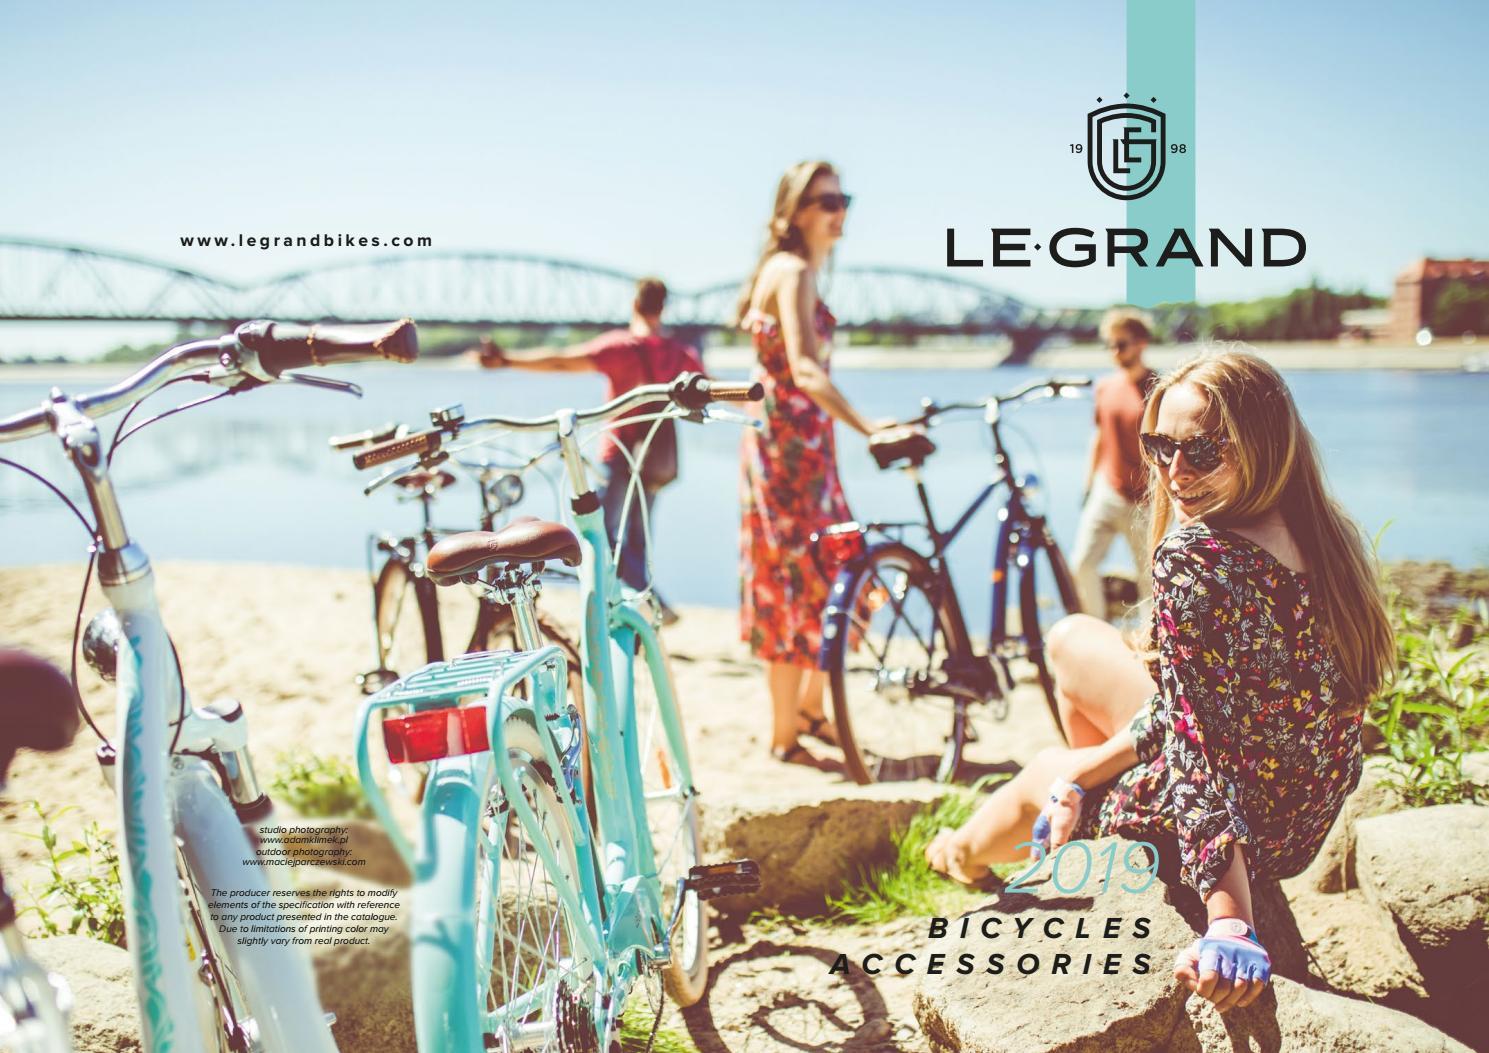 White Steel Mesh Bicycle Basket with Handle Lightweight Universal Bike//Cycle